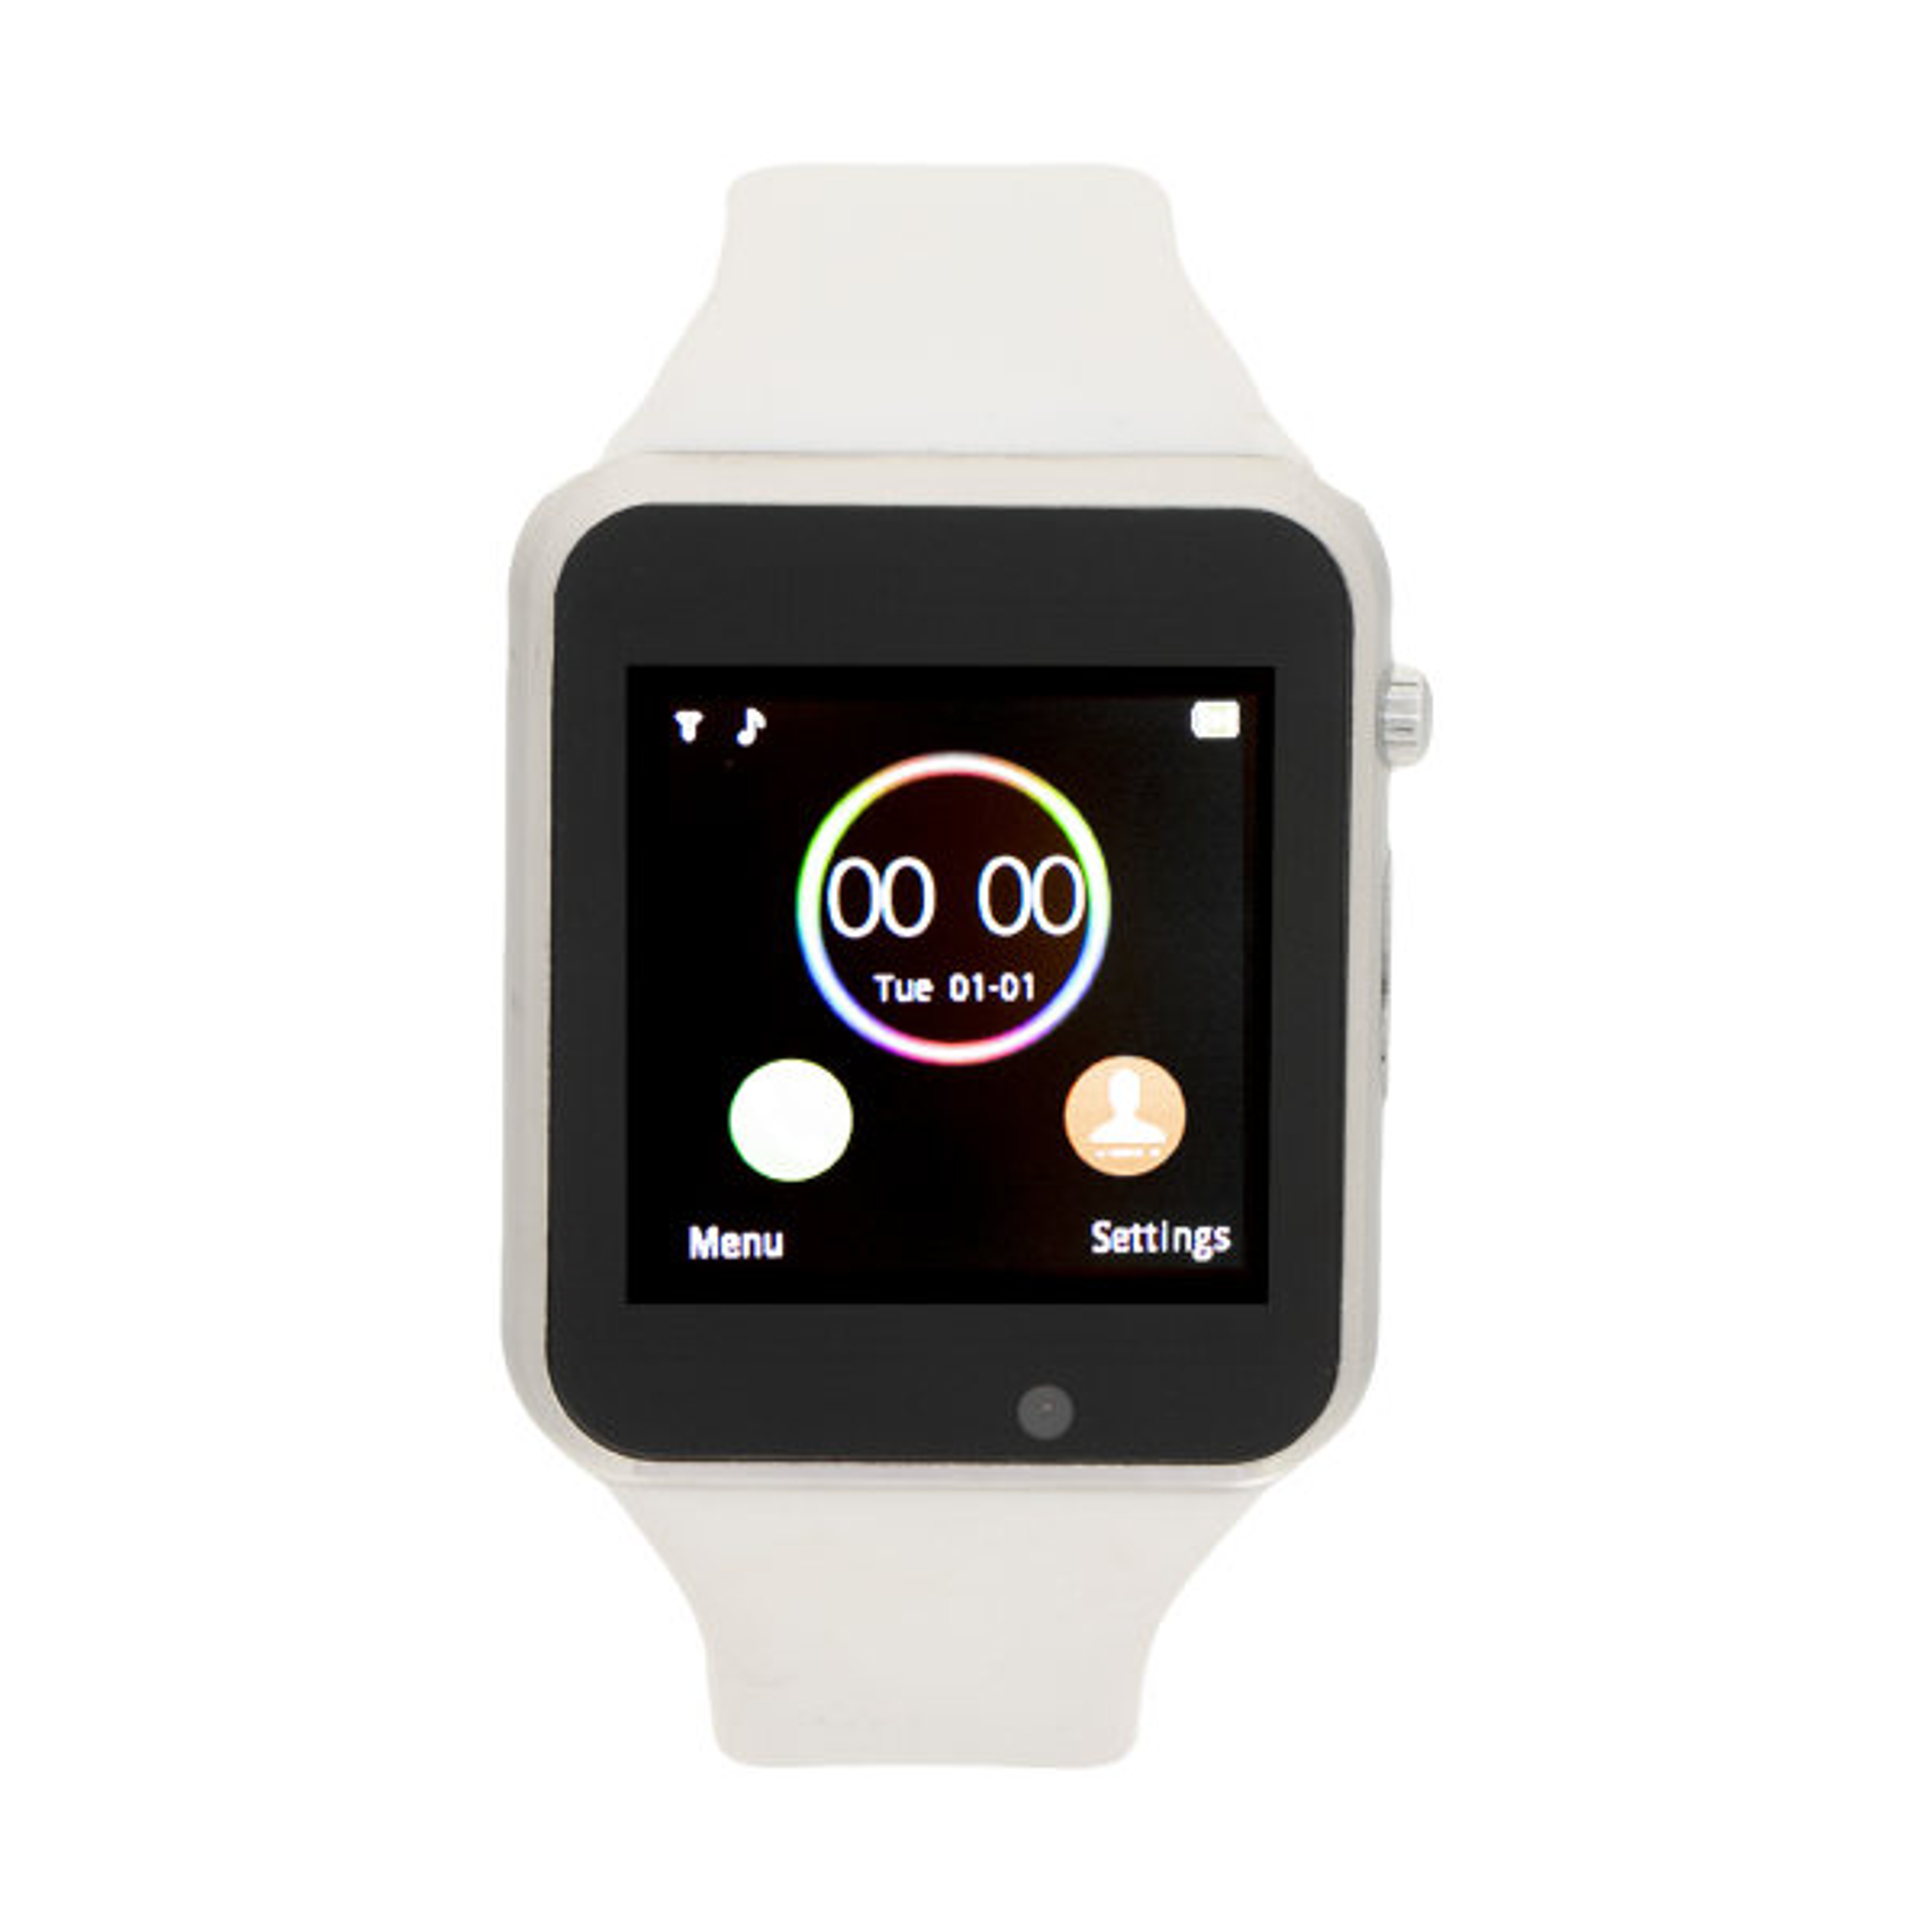 ساعت هوشمند ریدوکس مدل A1